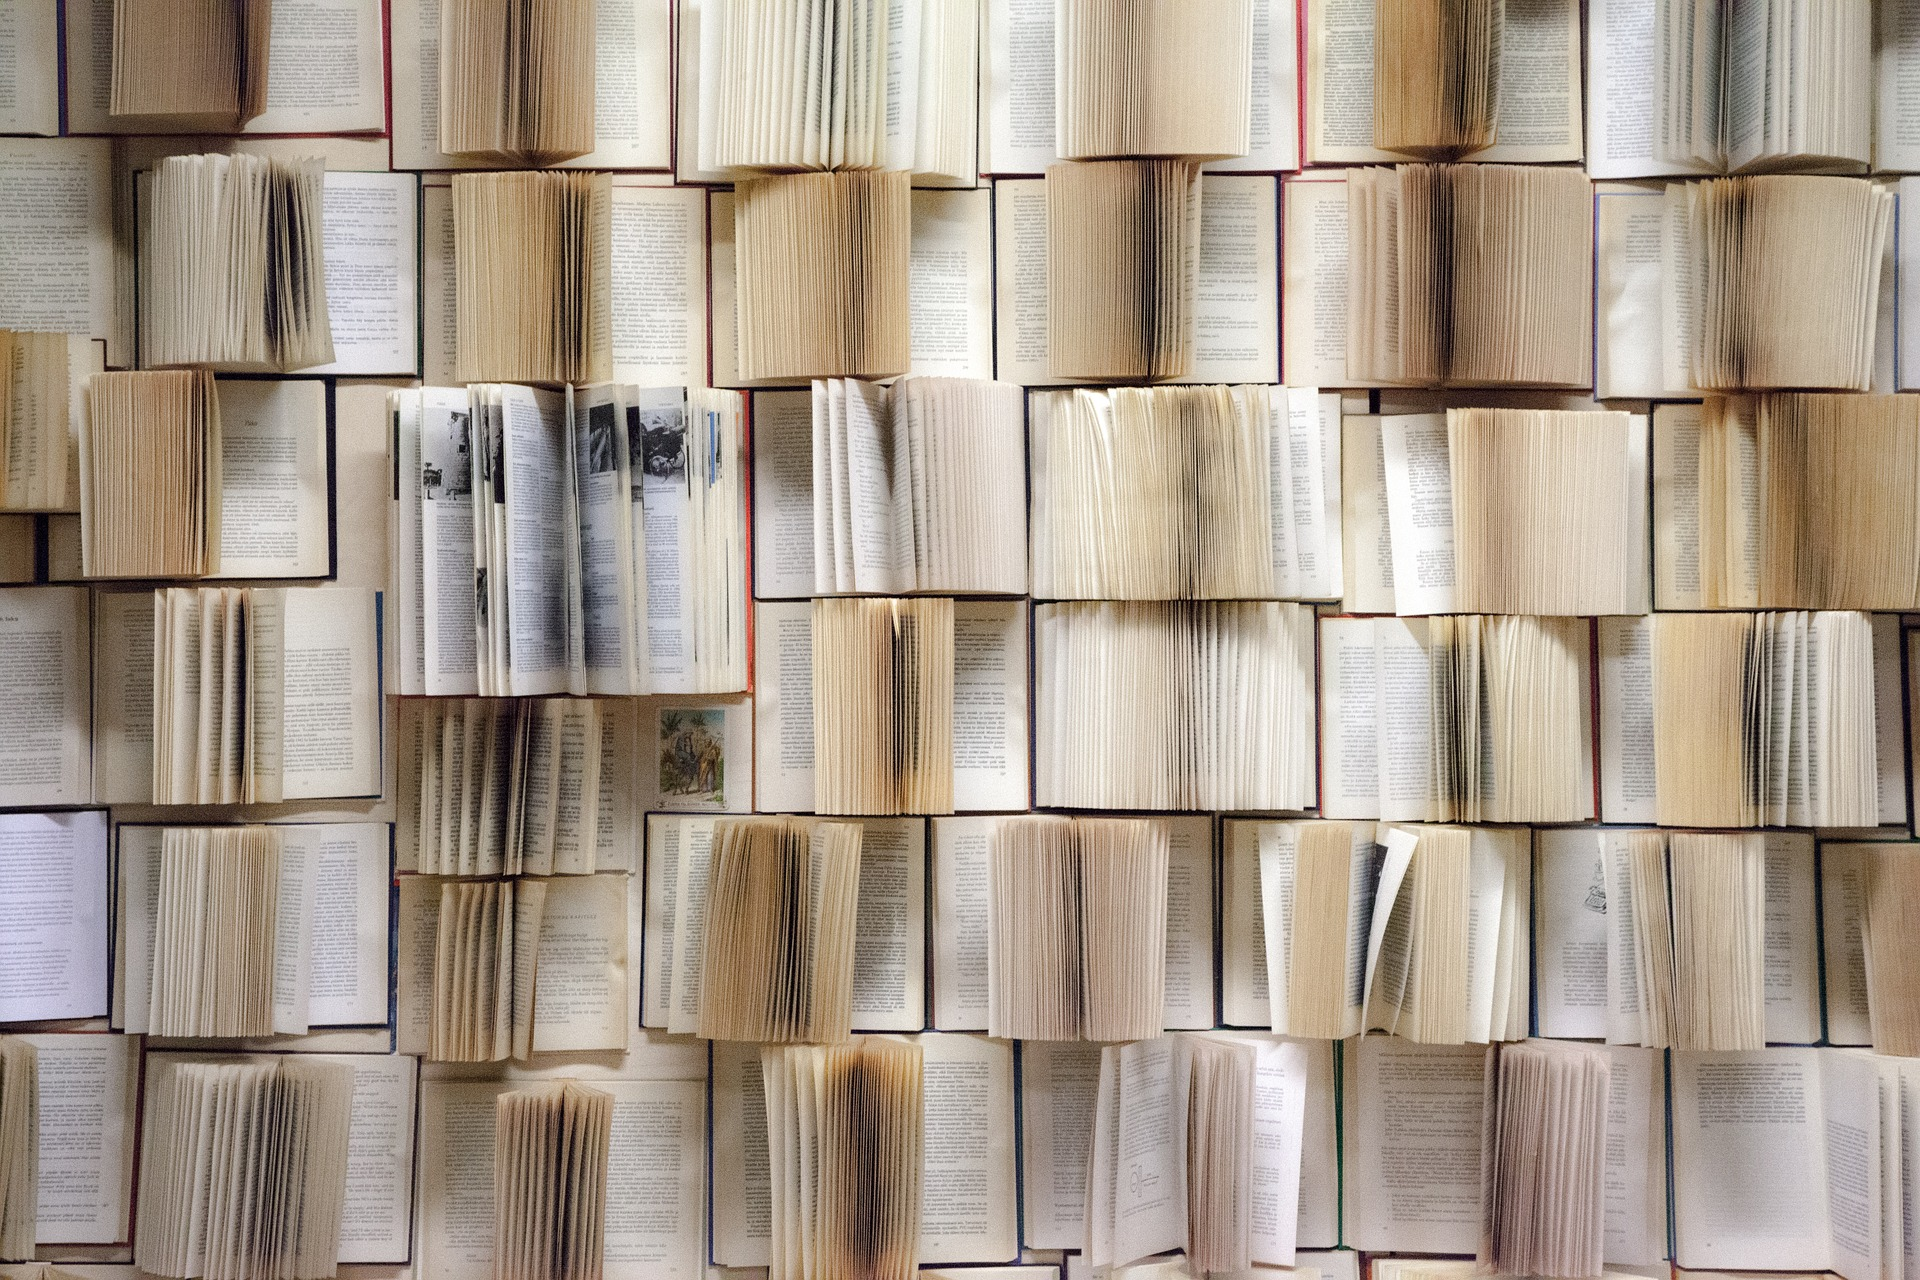 book-wall-1151405_1920.jpg